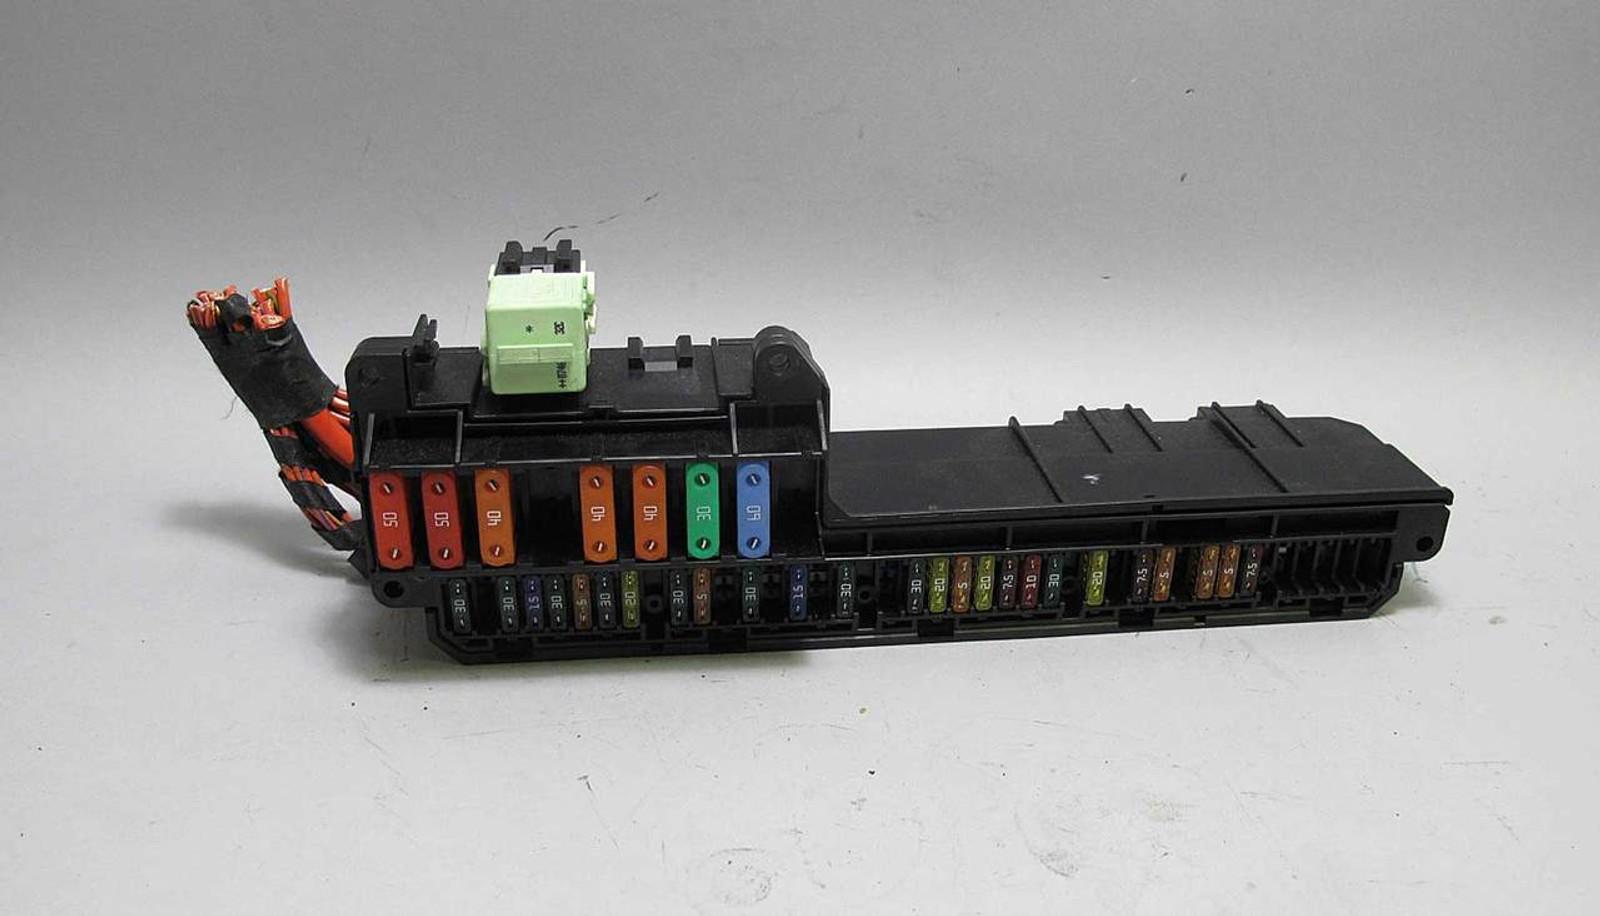 e63 645ci fuse box wiring diagram reviewbmw e60 5 6 series e63 interior glove box front [ 1600 x 916 Pixel ]